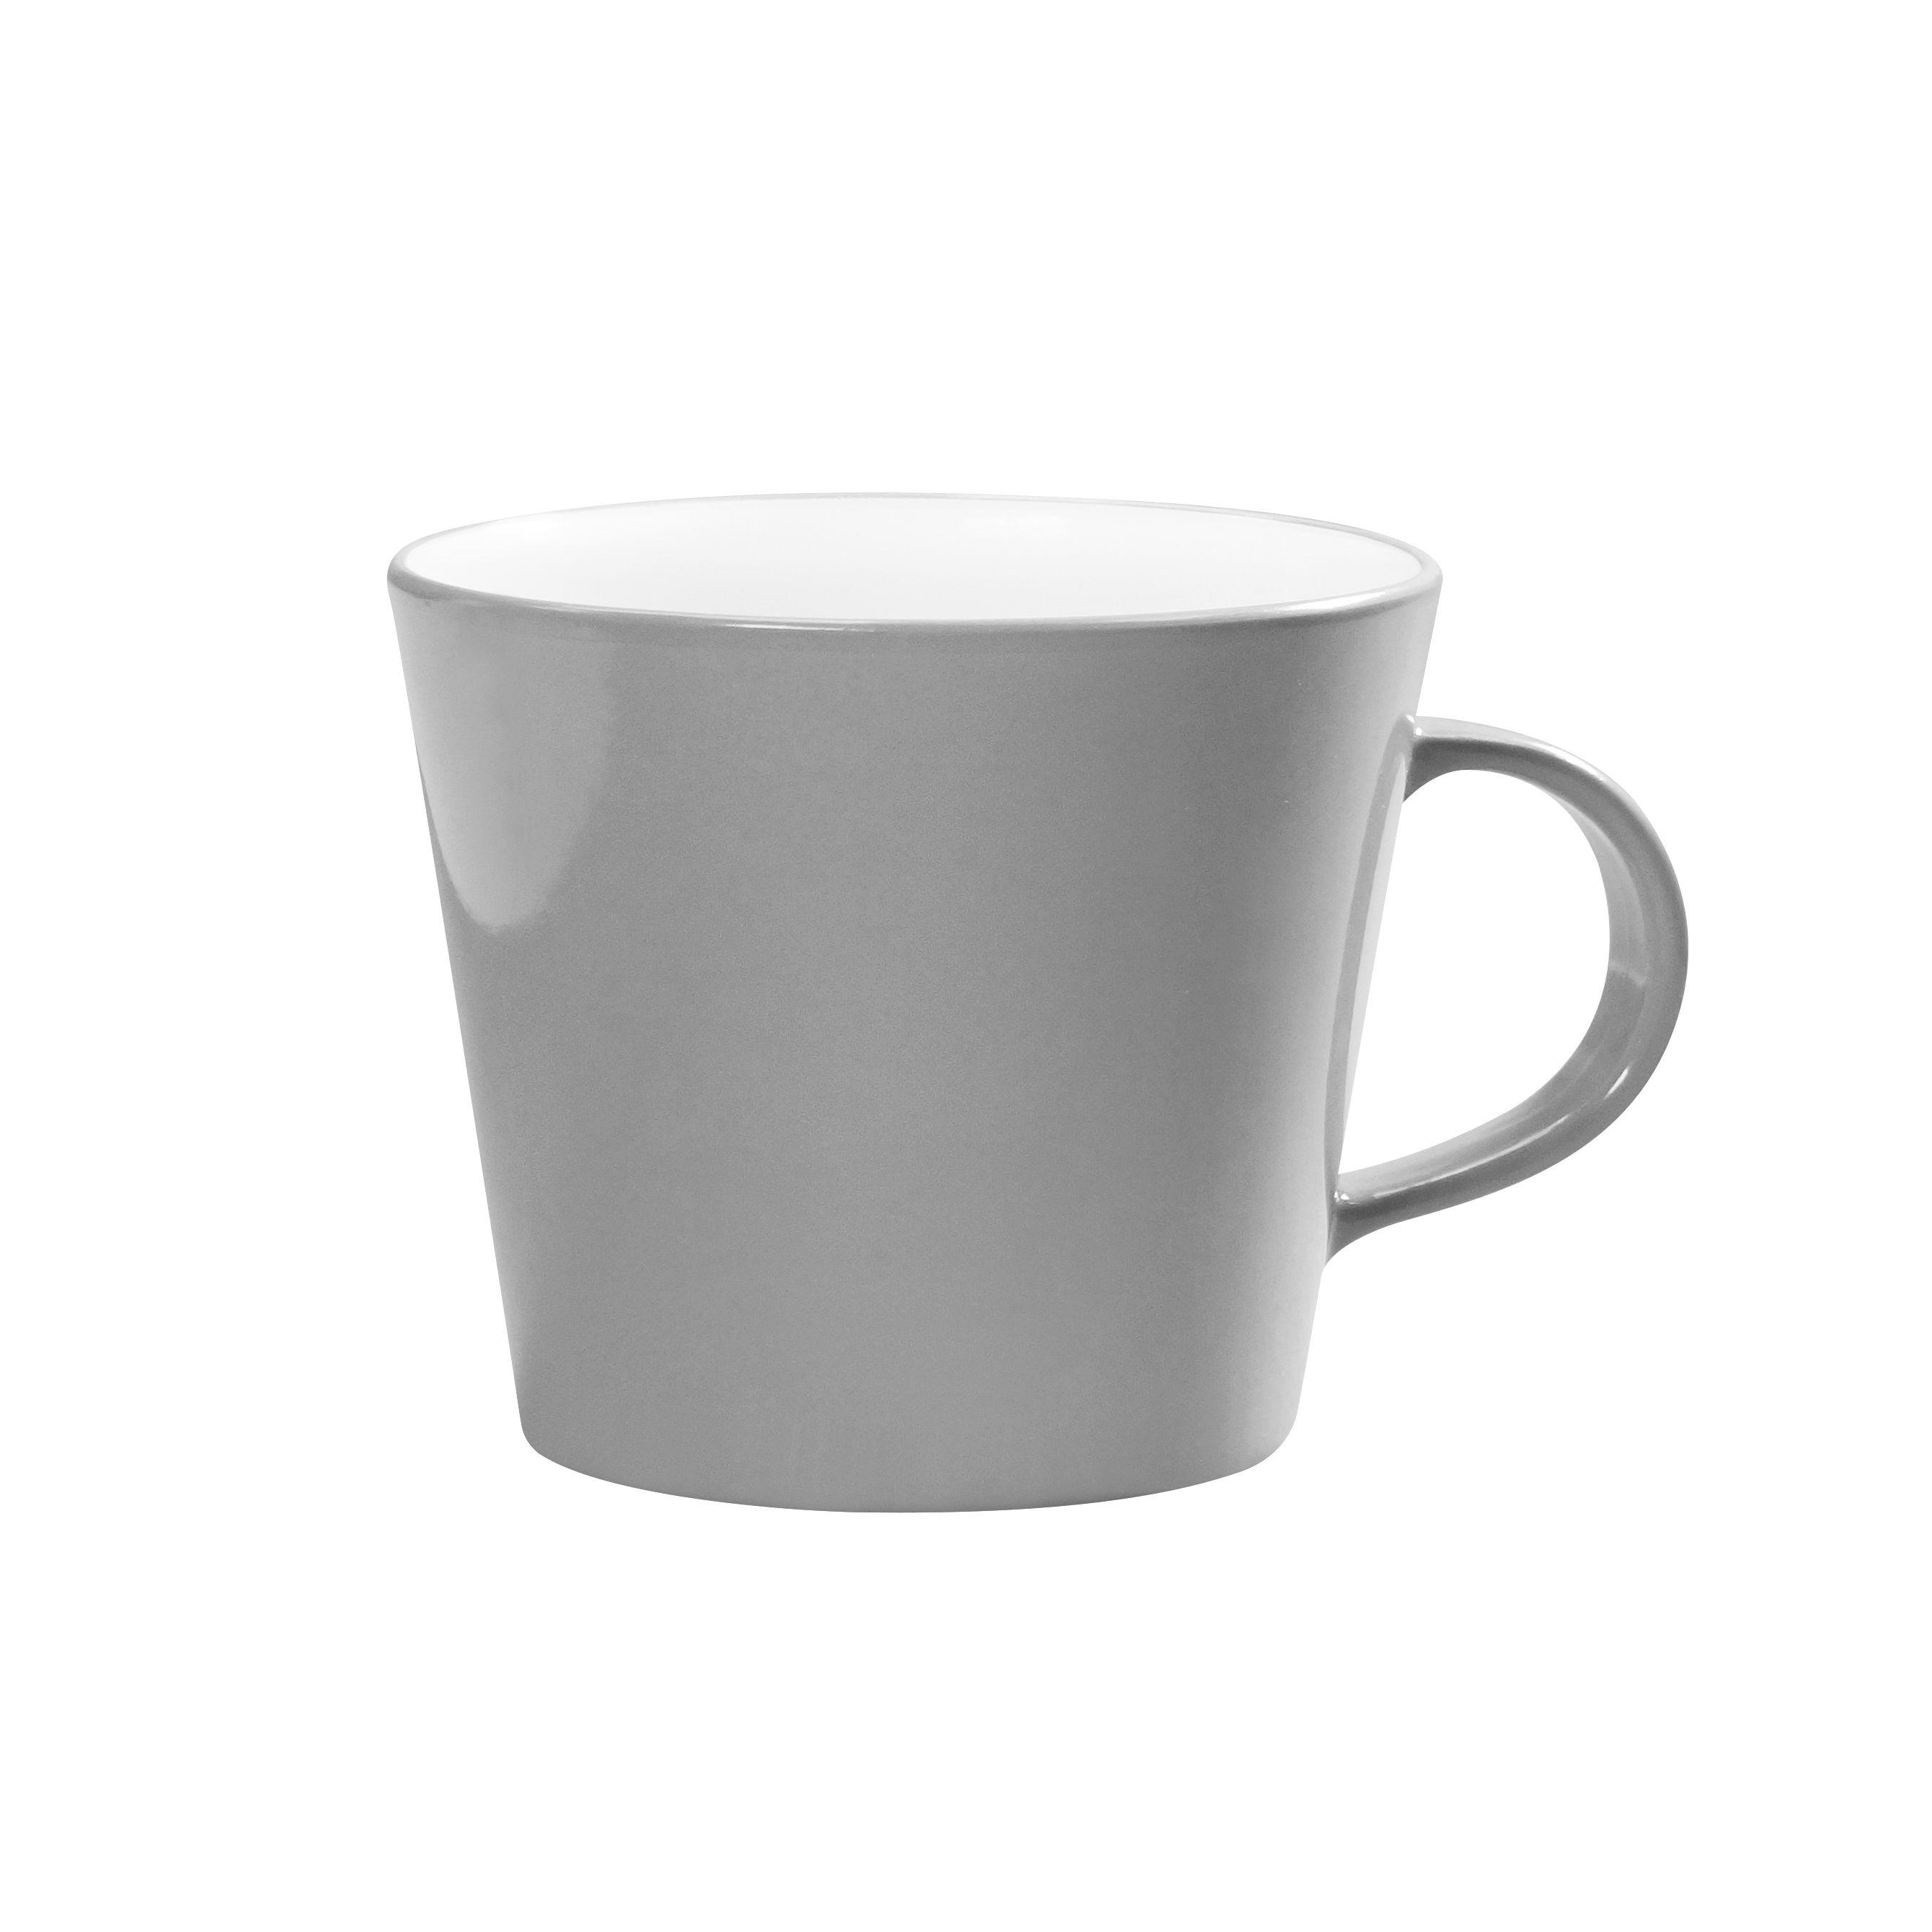 Mug personnalisable écologique Newlifz bleu marine - mug promotionnel